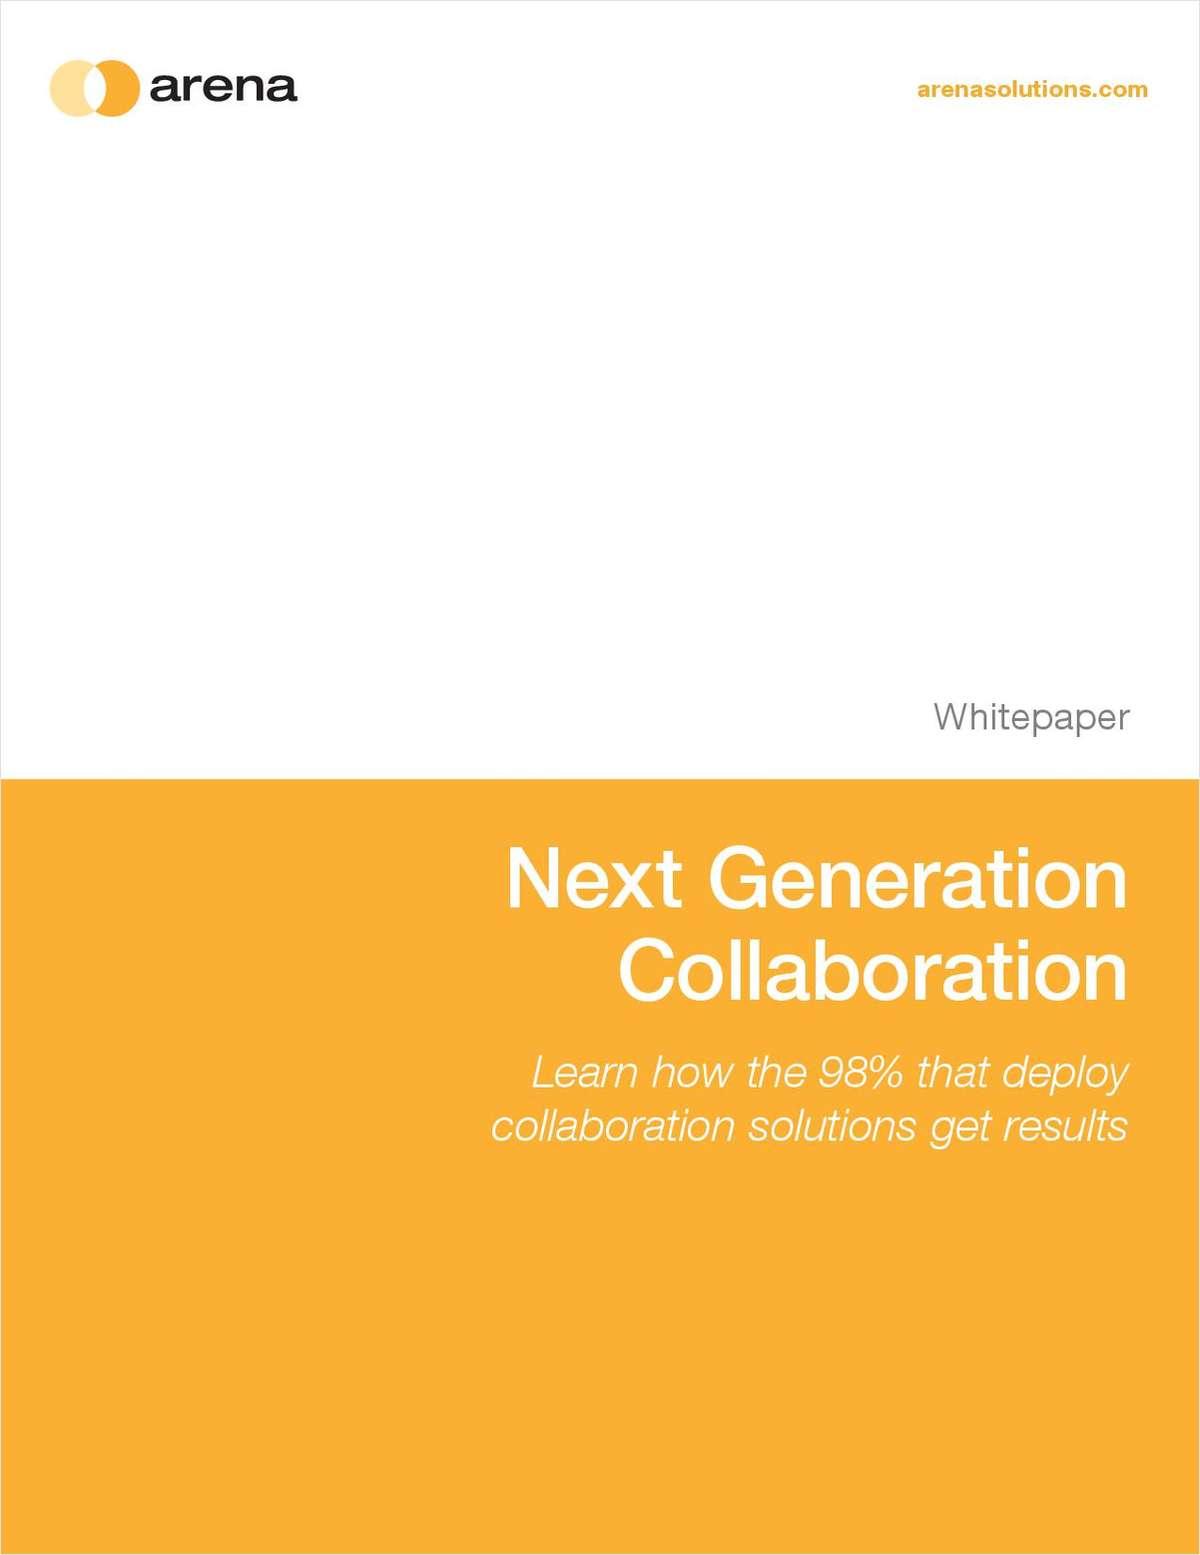 Next Generation Collaboration